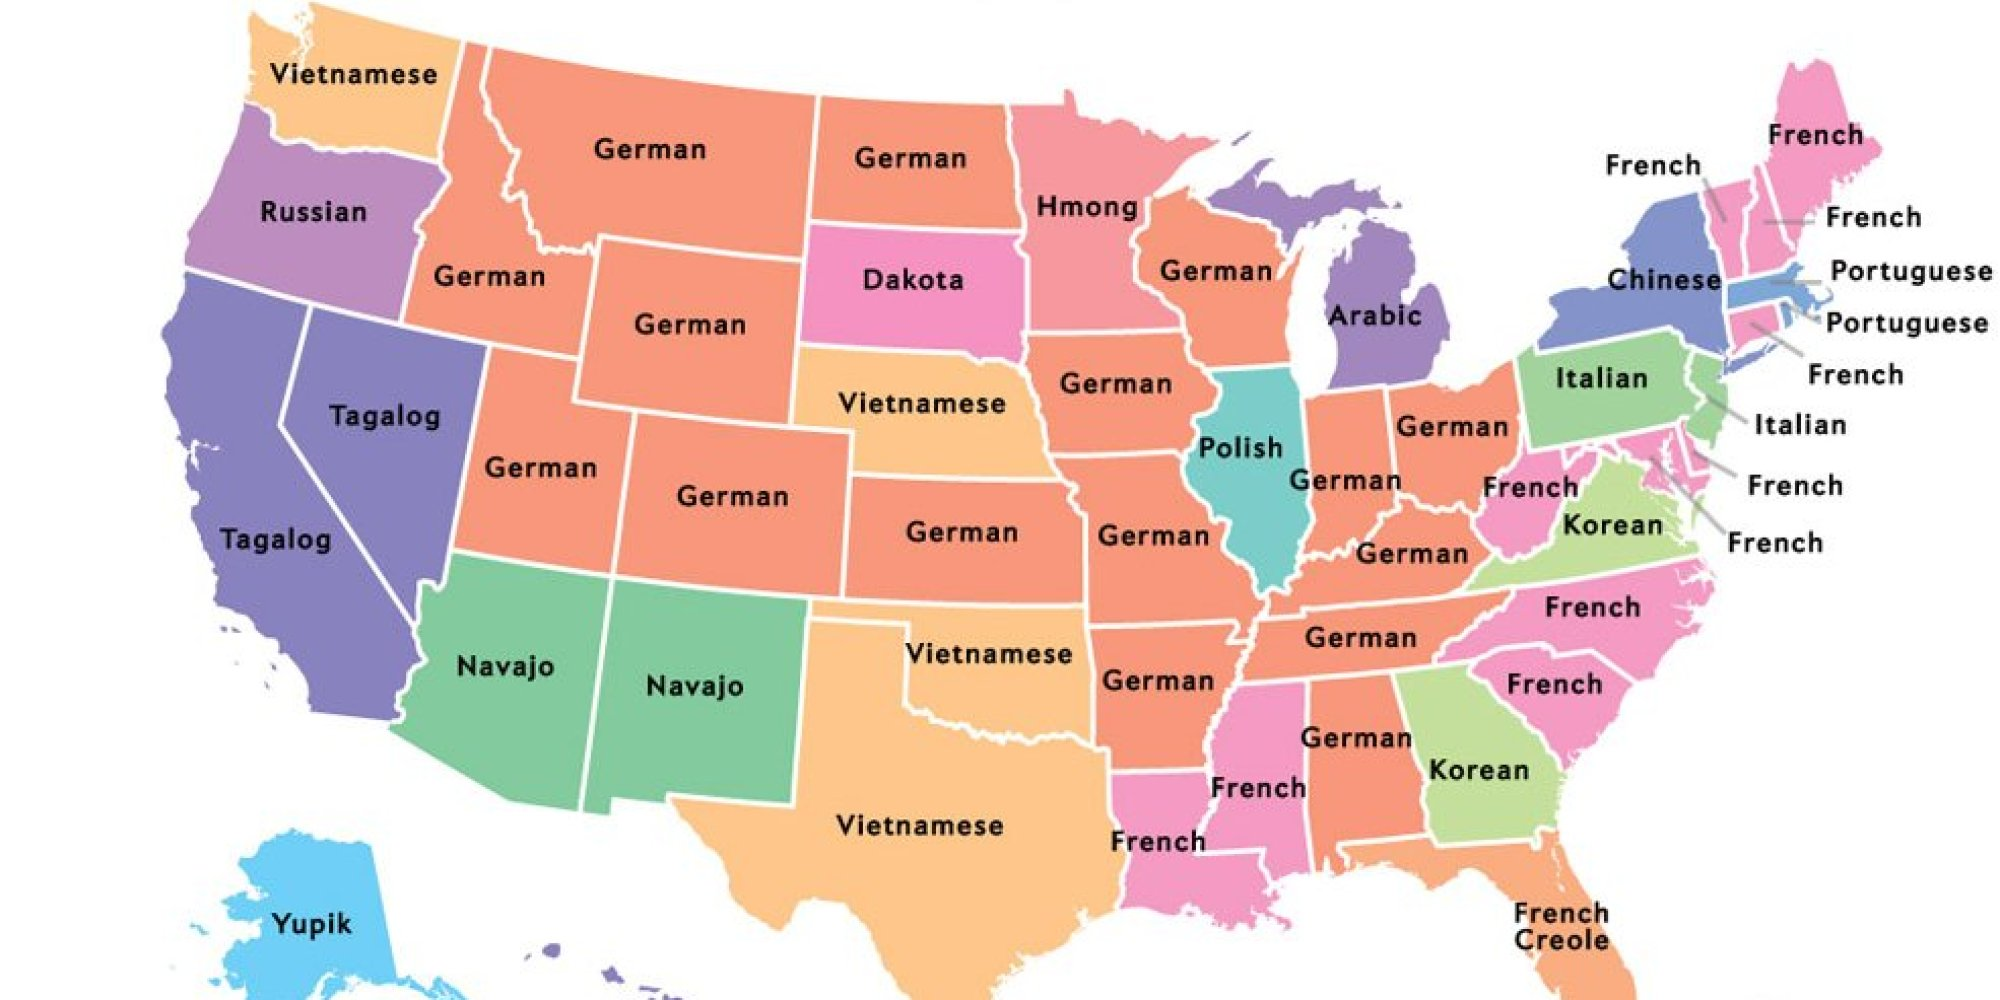 Bundesstaaten Usa Karte.Die Bundesstaaten Der Usa Karte Creactie